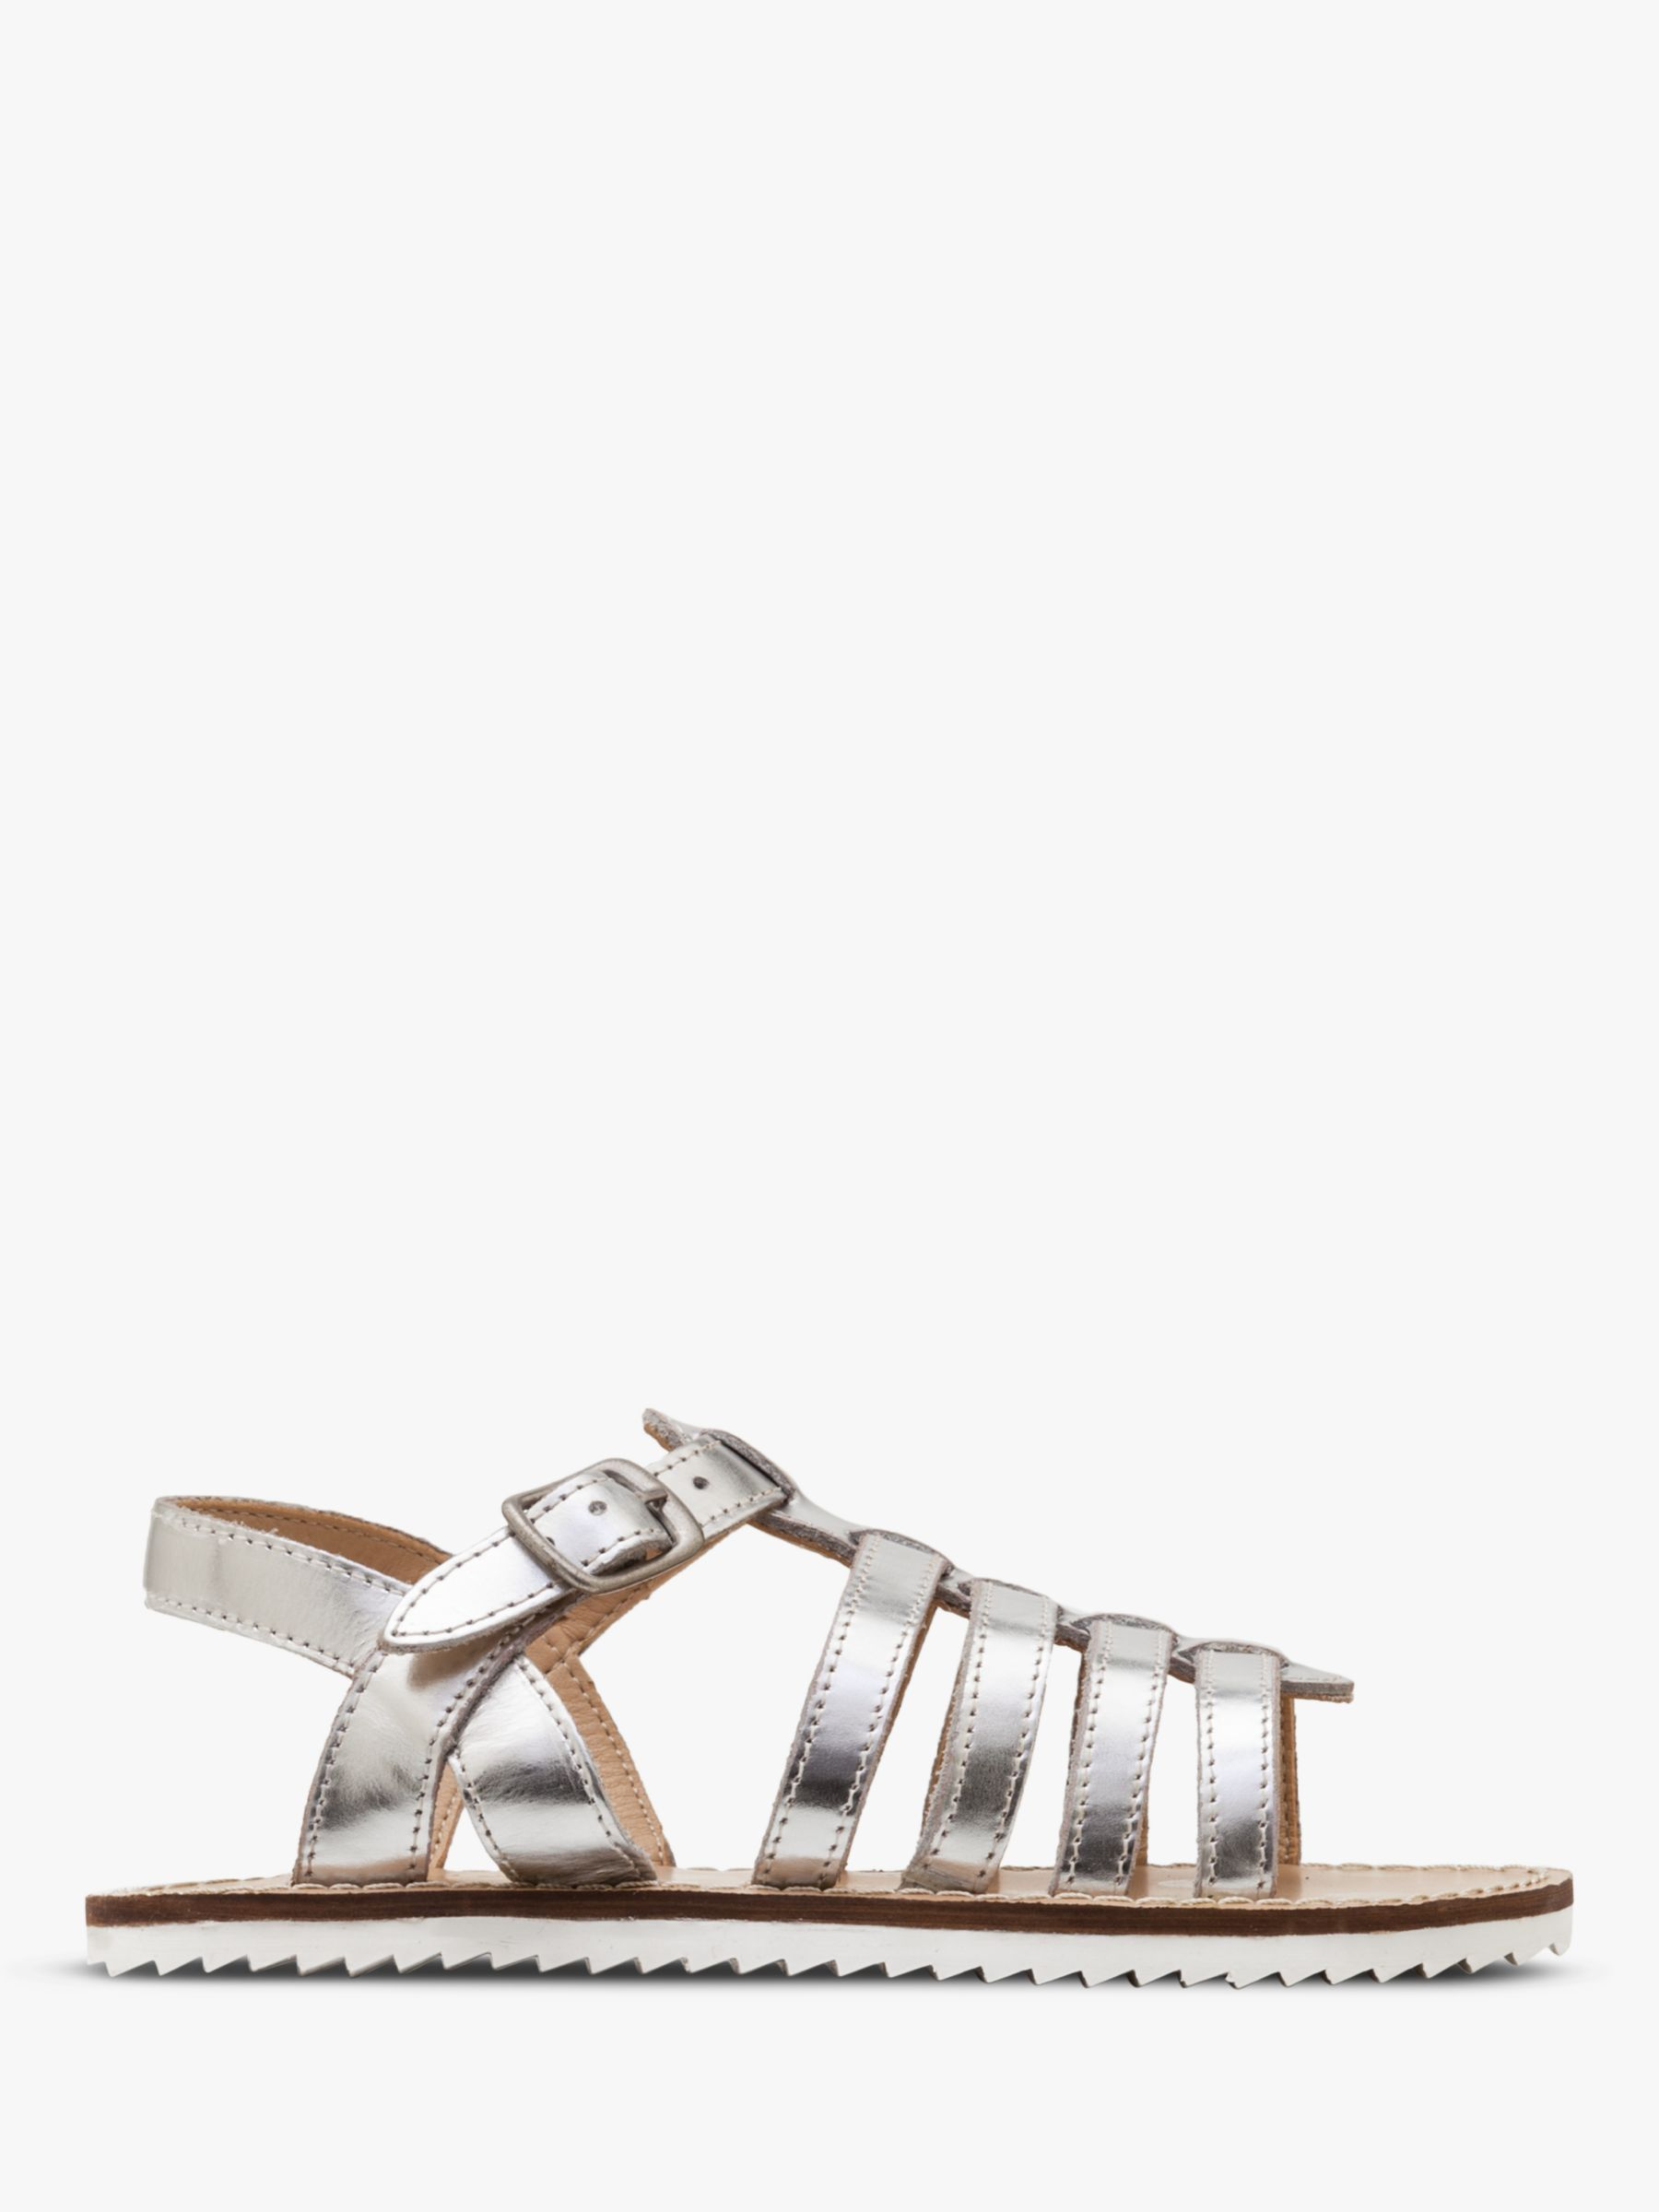 Mini Boden Mini Boden Children's Leather Gladiator Sandals, Metallic Silver